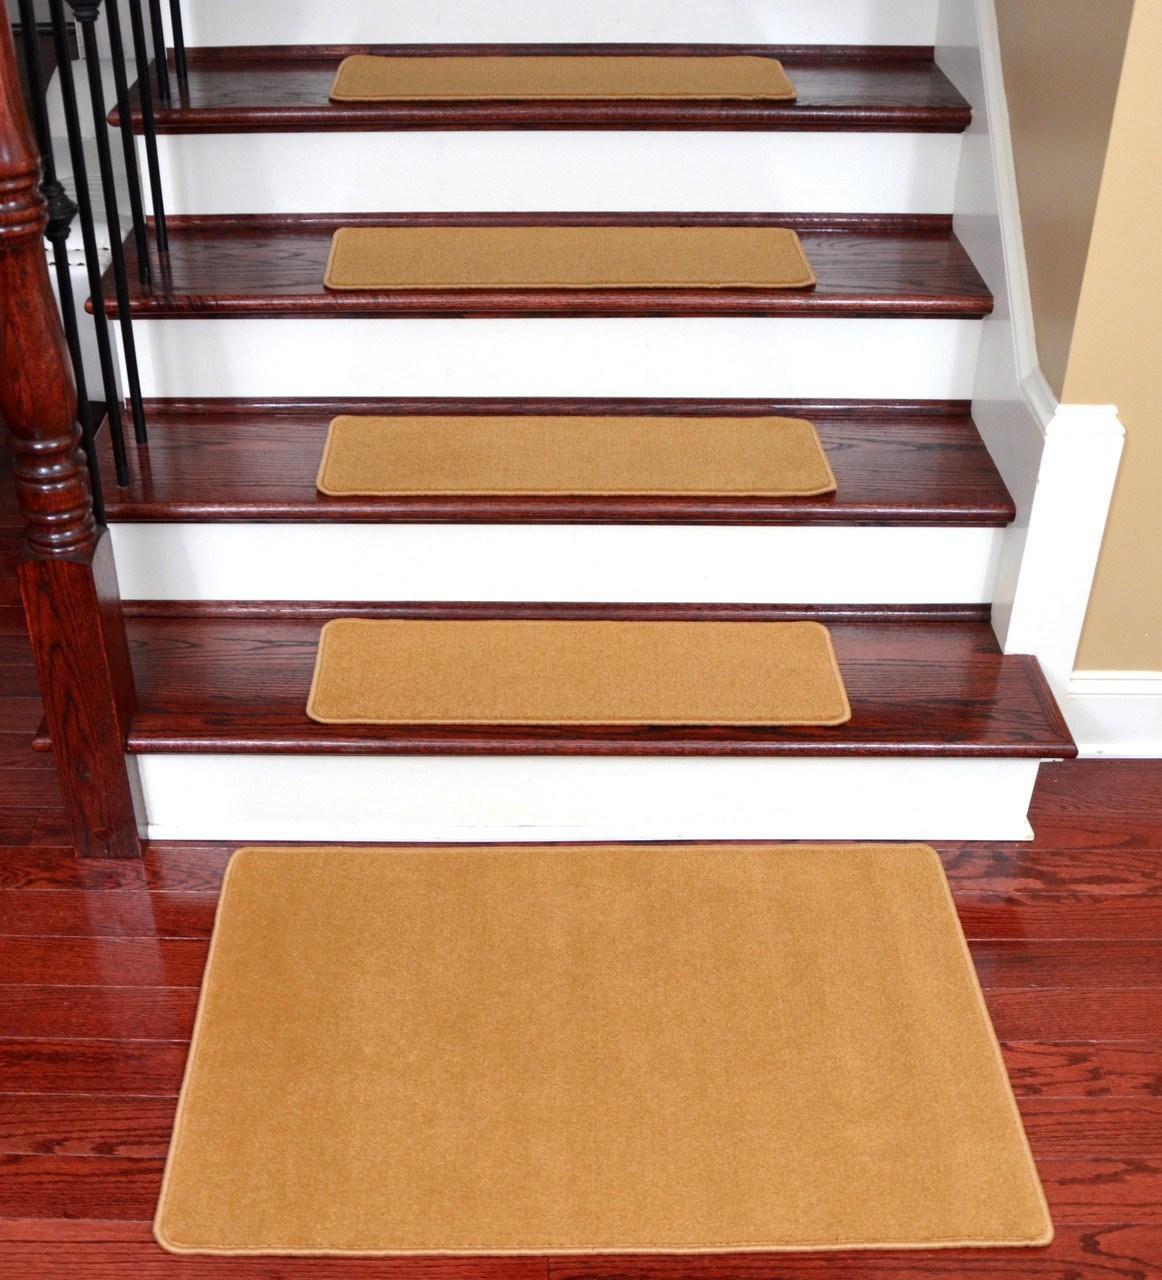 Dean Washable Non Slip Nylon Carpet Stair Treads Gold Coast | Nylon Carpet For Stairs | Berber Carpet | Non Slip | Tread Covers | Rug | Stairway